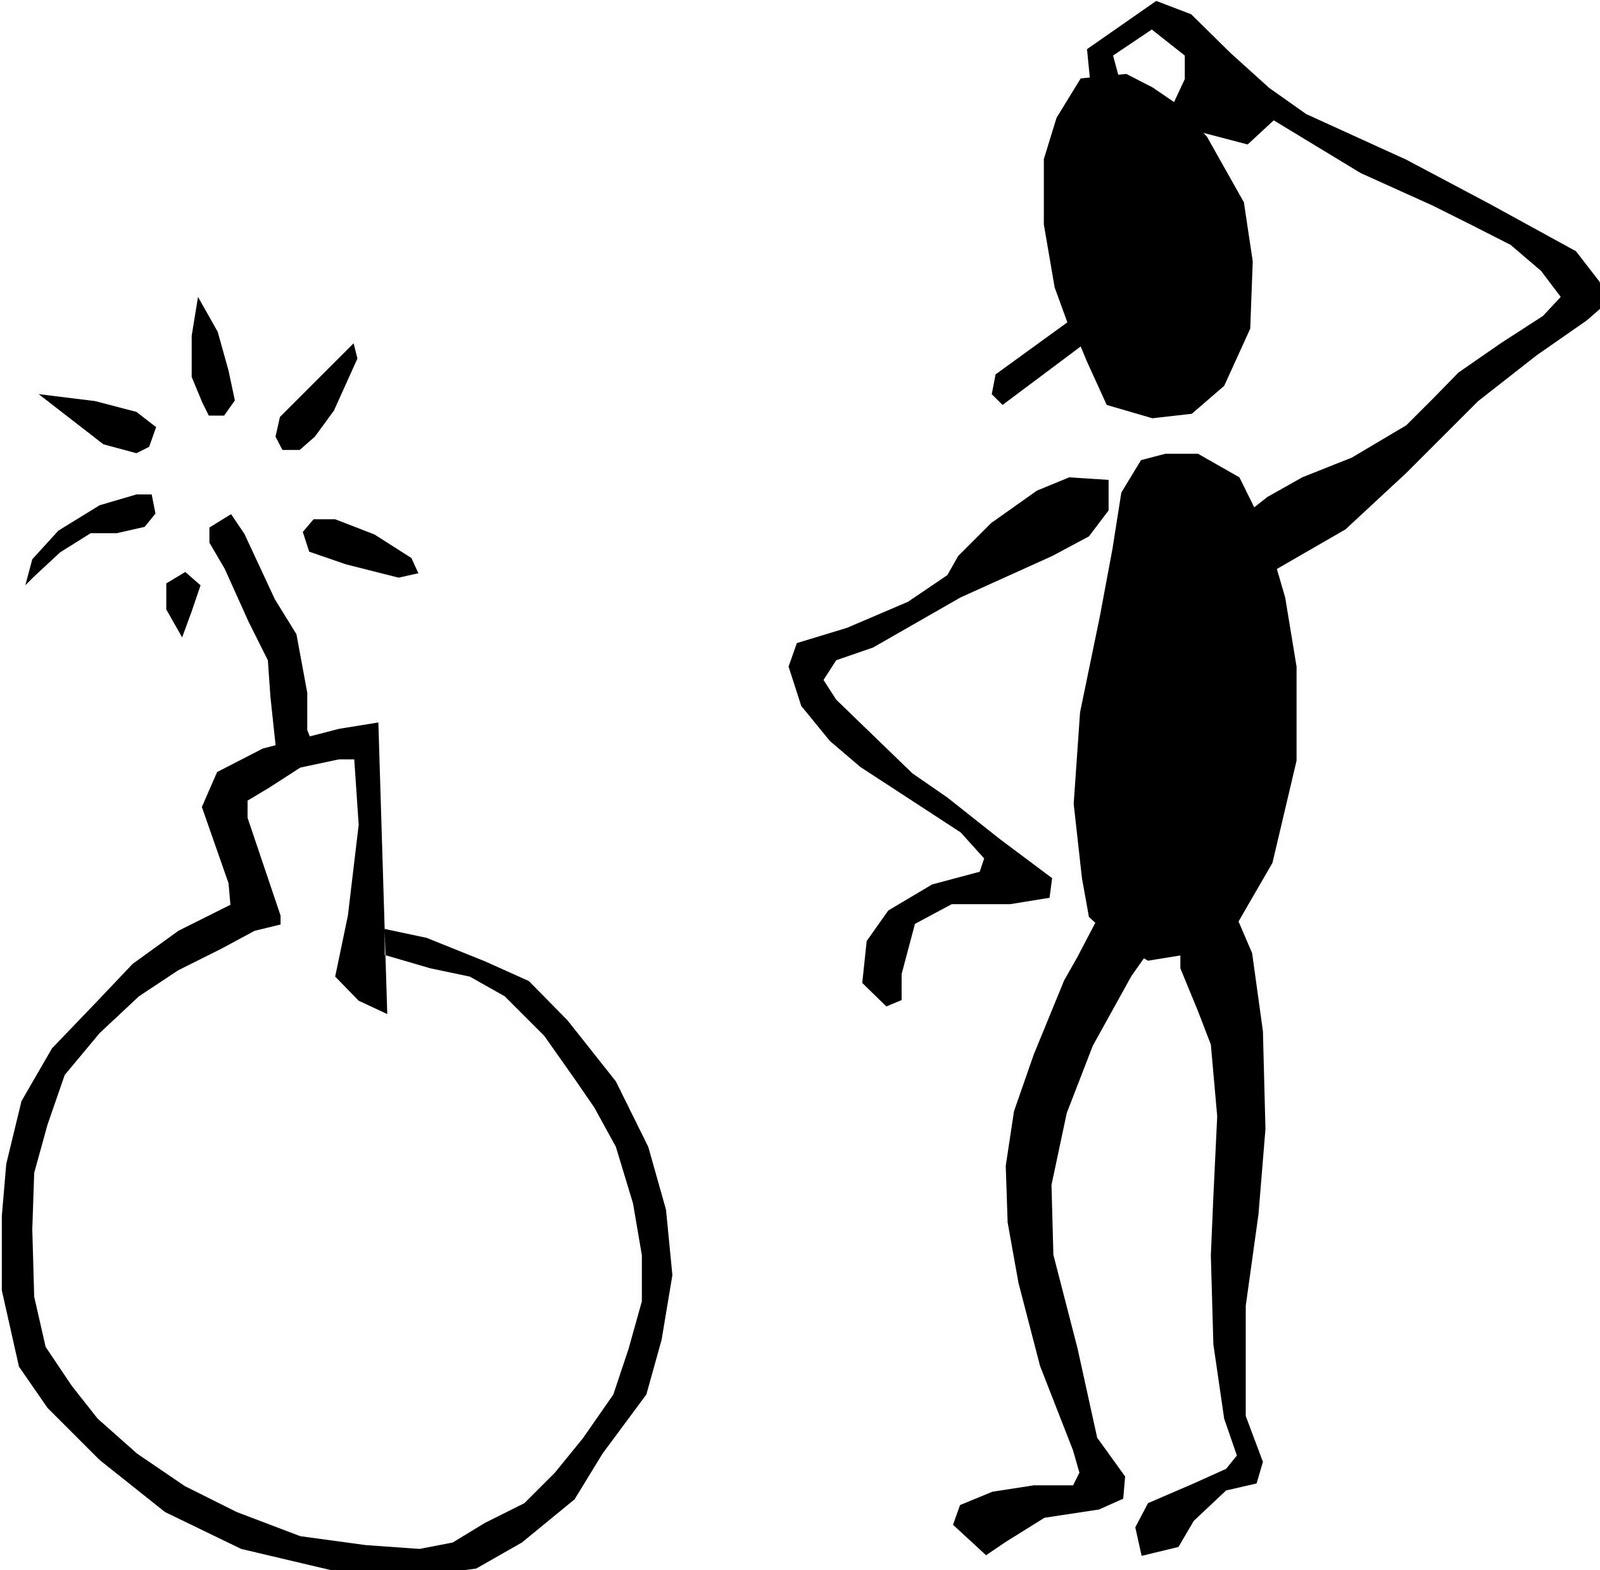 1600x1570 Man Clipart Thinking Stick